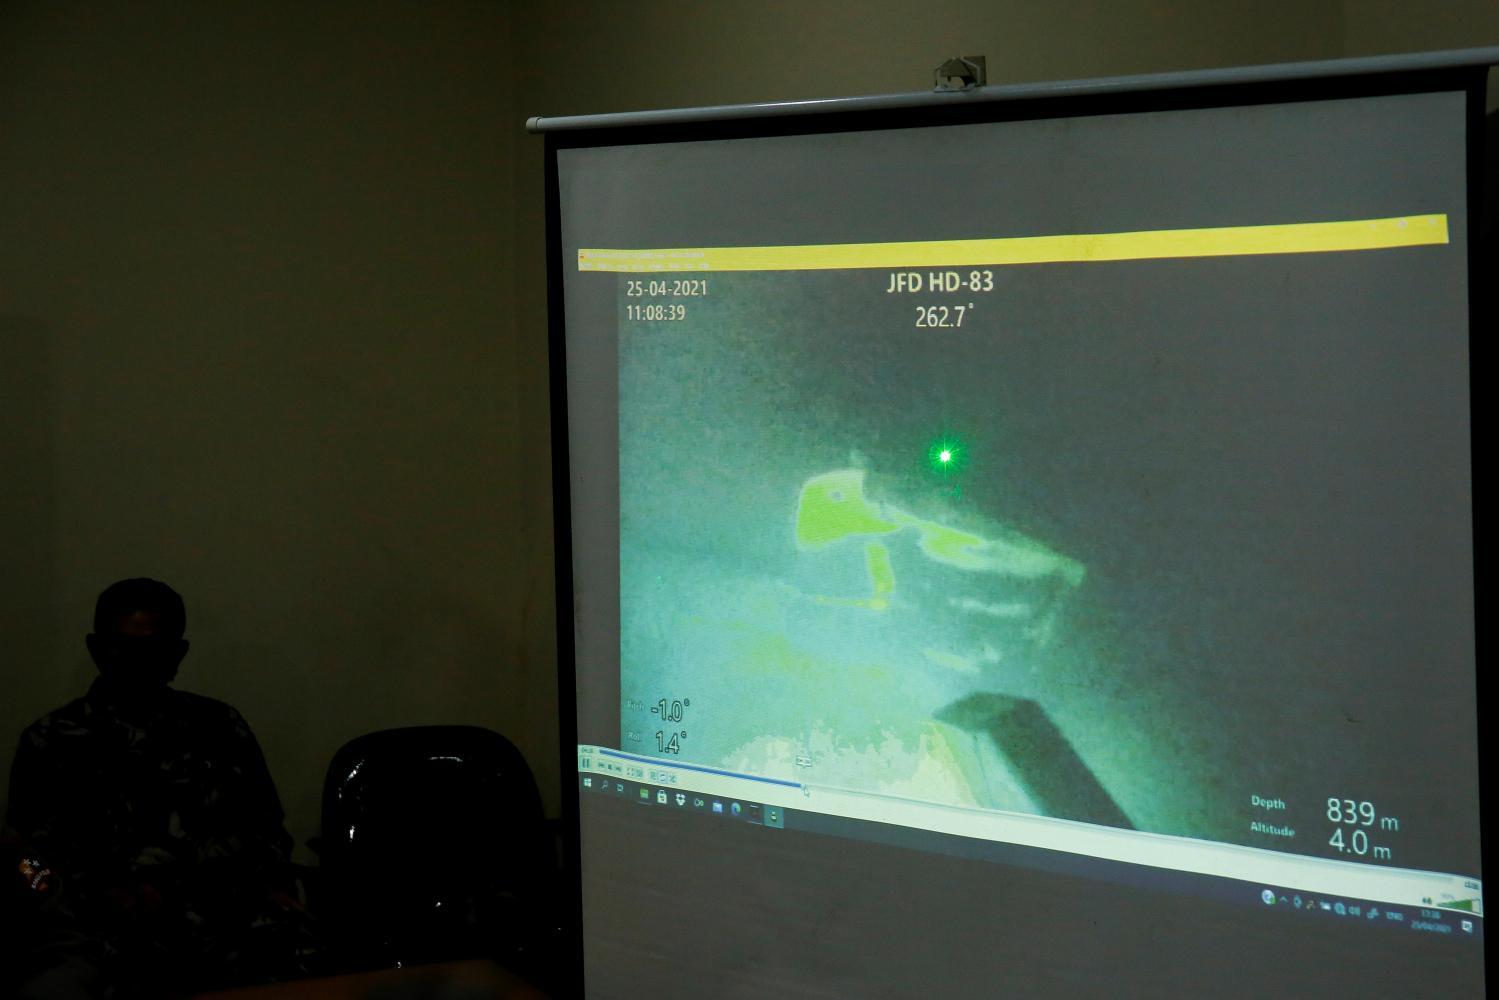 Sub Salvage Mission Brings Jakarta, Beijing Closer